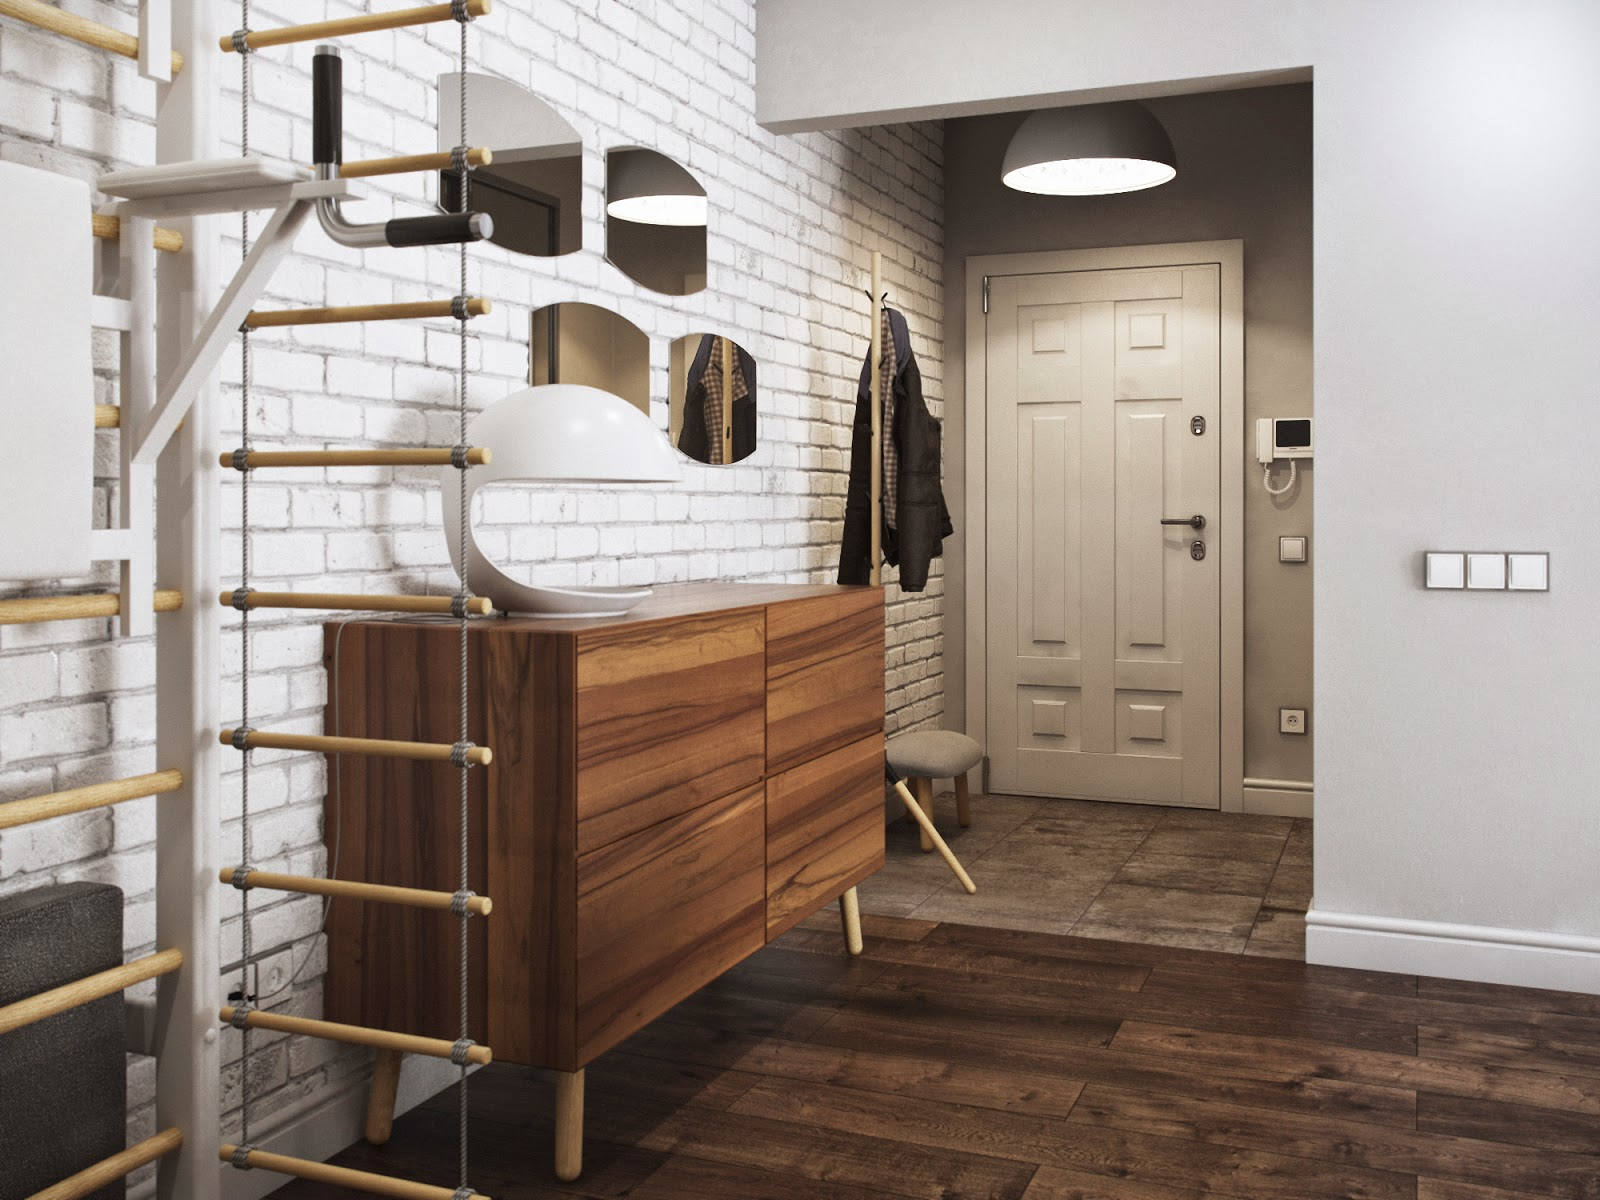 prixozhaya v xrushchevke - Идеи для ремонта коридора в квартире